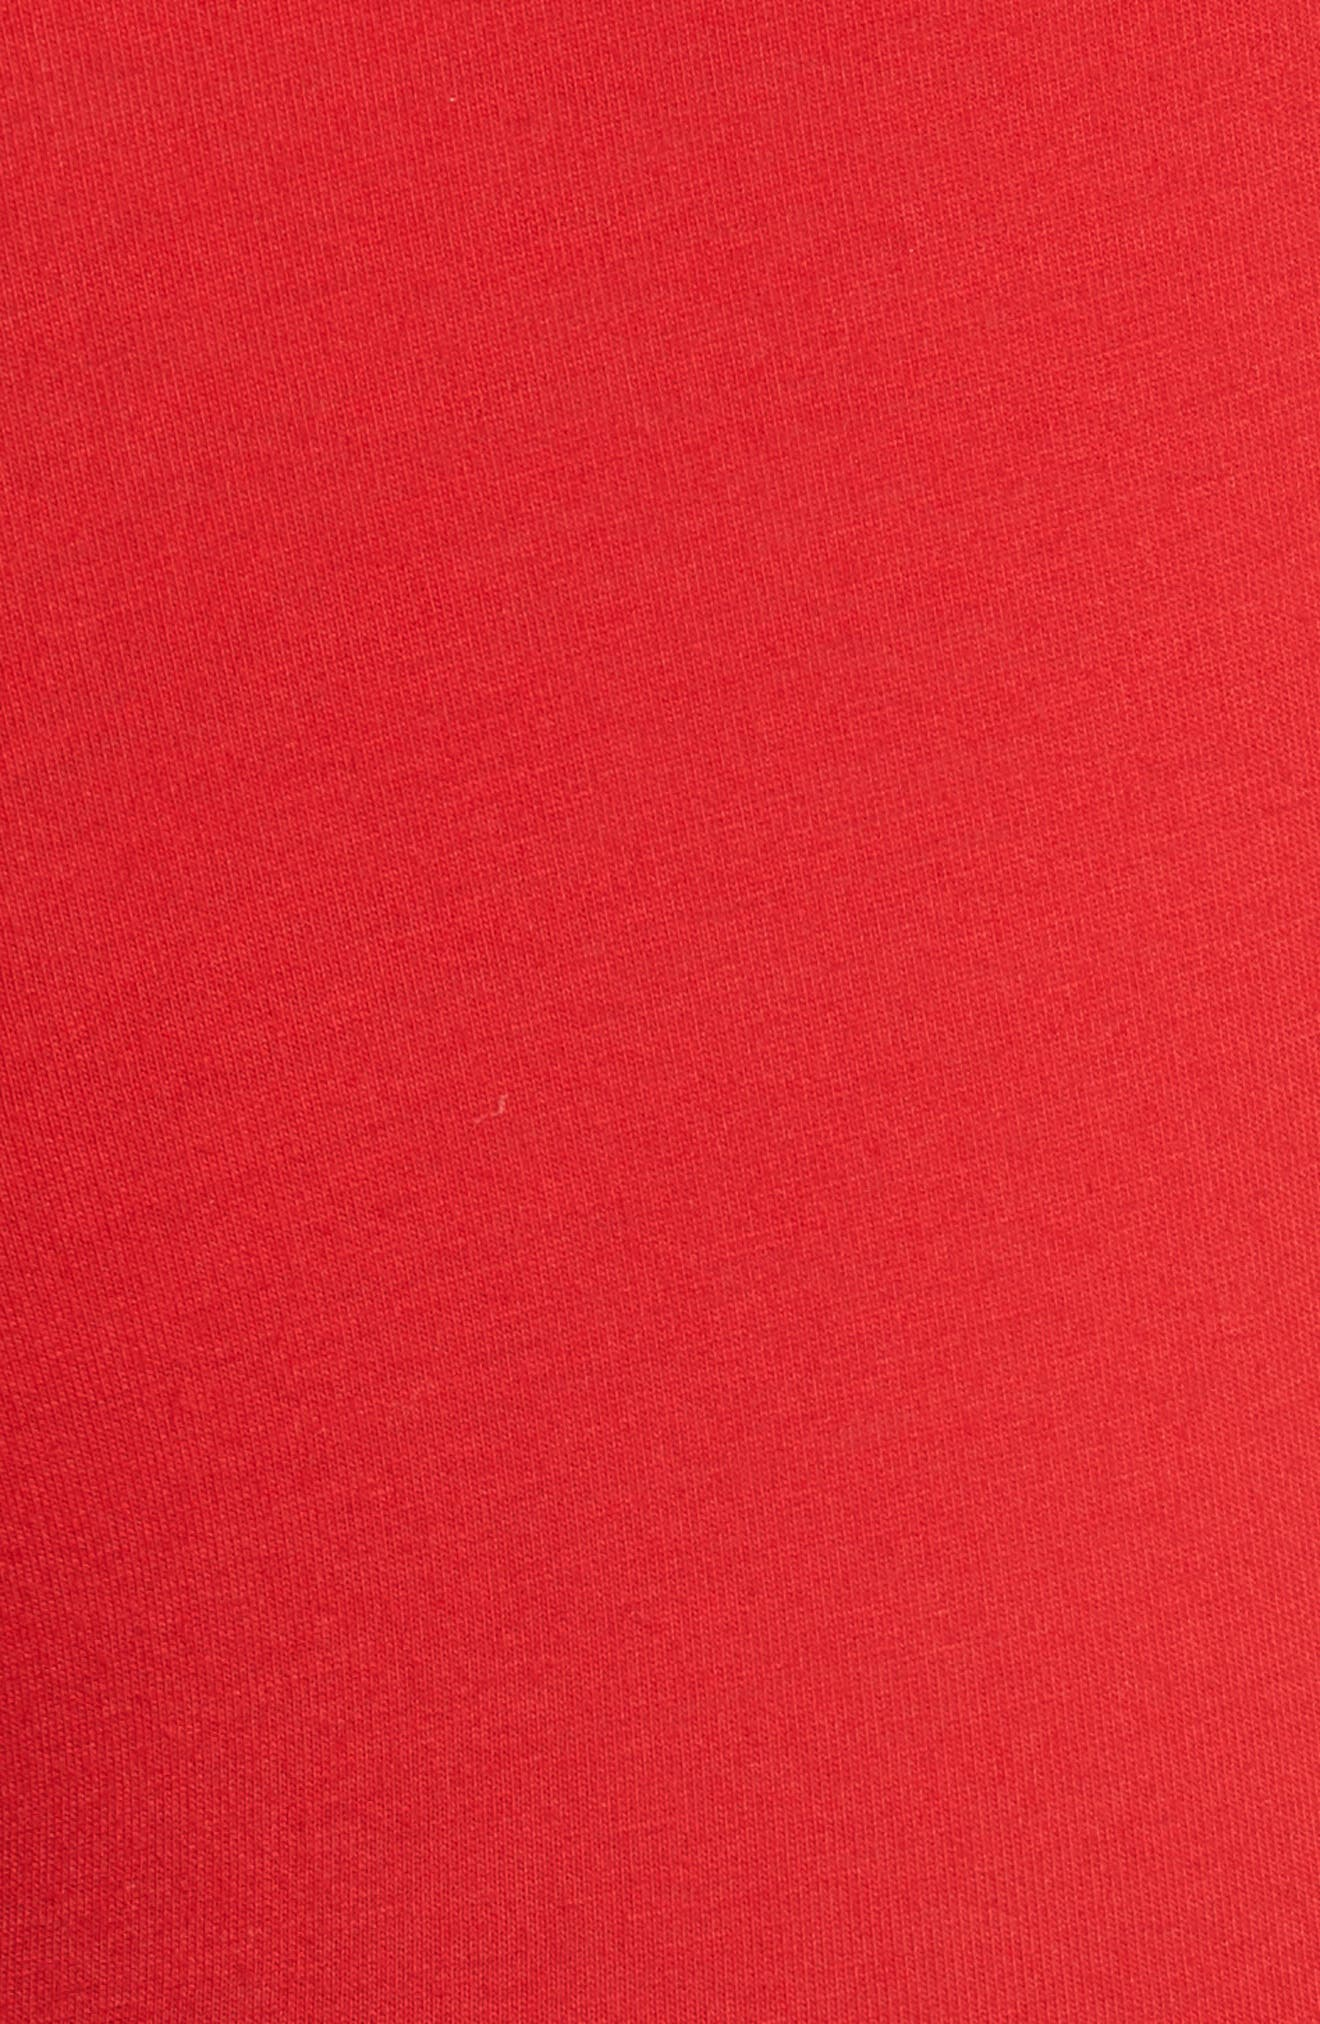 Cotton Stretch Boxer Briefs,                             Alternate thumbnail 5, color,                             RL 2000 RED/ POLO BLACK